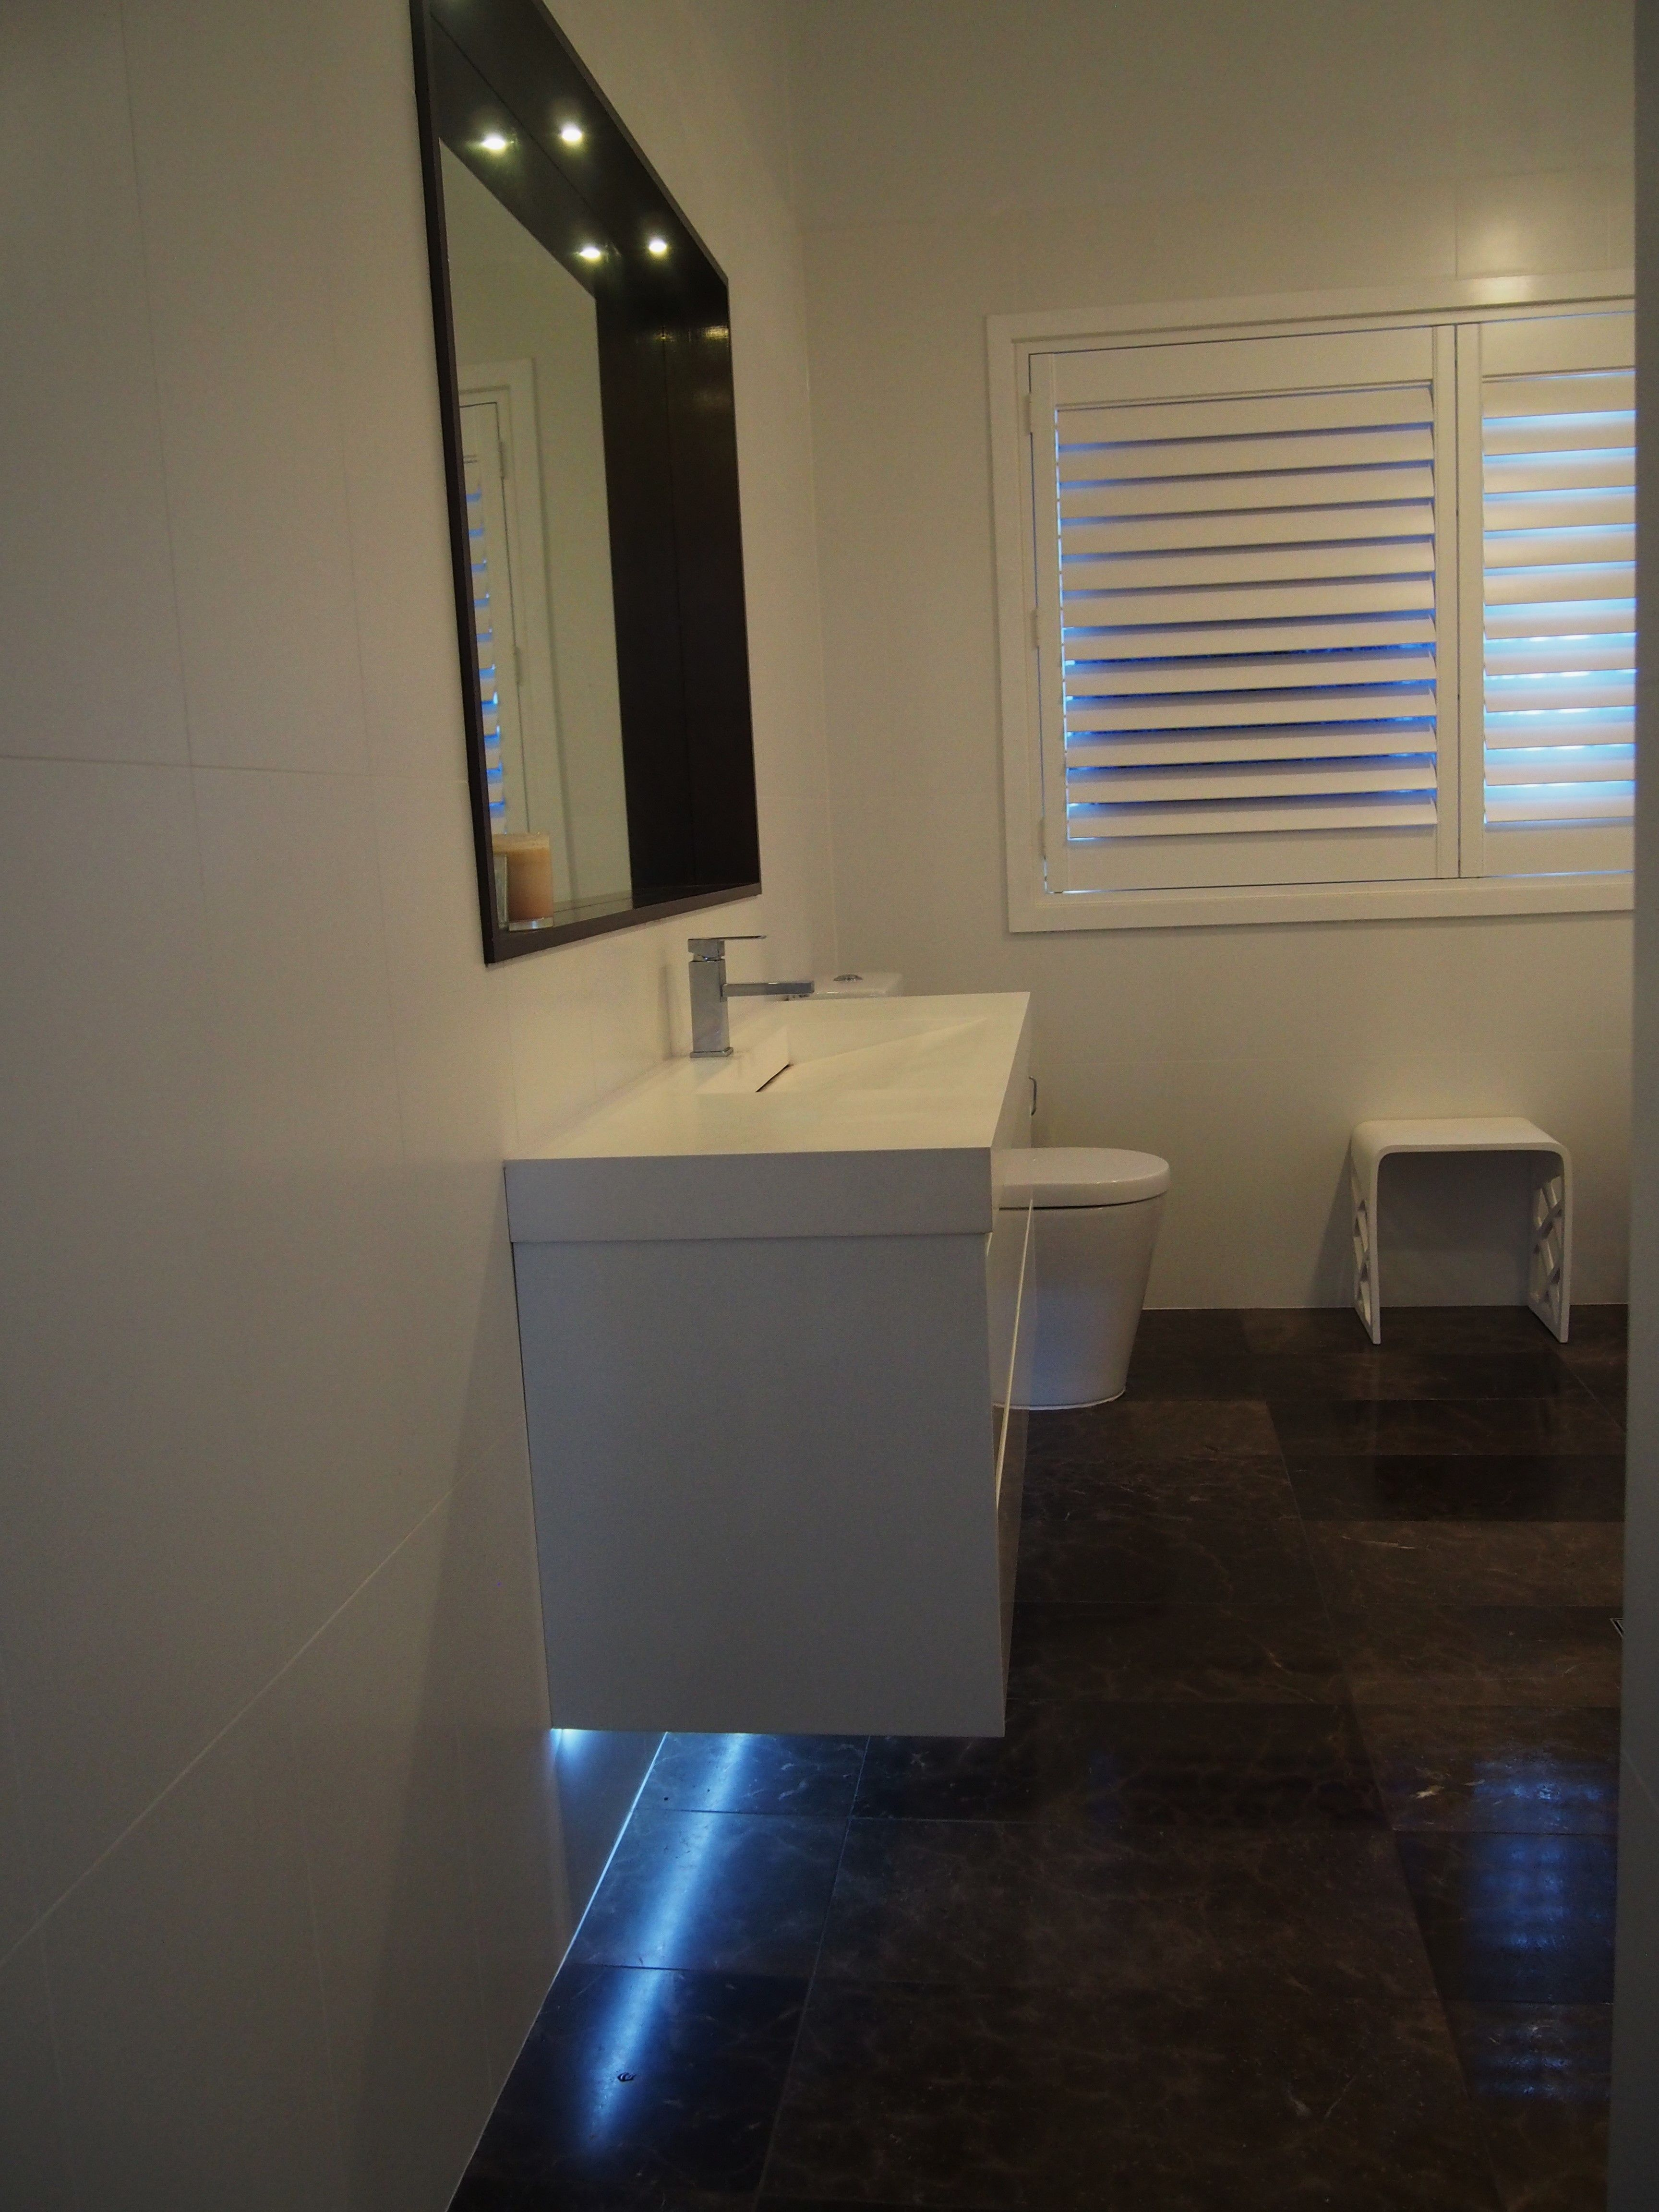 Bathroom Lighting Led Recessed Mirror Lights U0026 Under Vanity Led Strip Lighting All In Warm Deco Led Deco Led